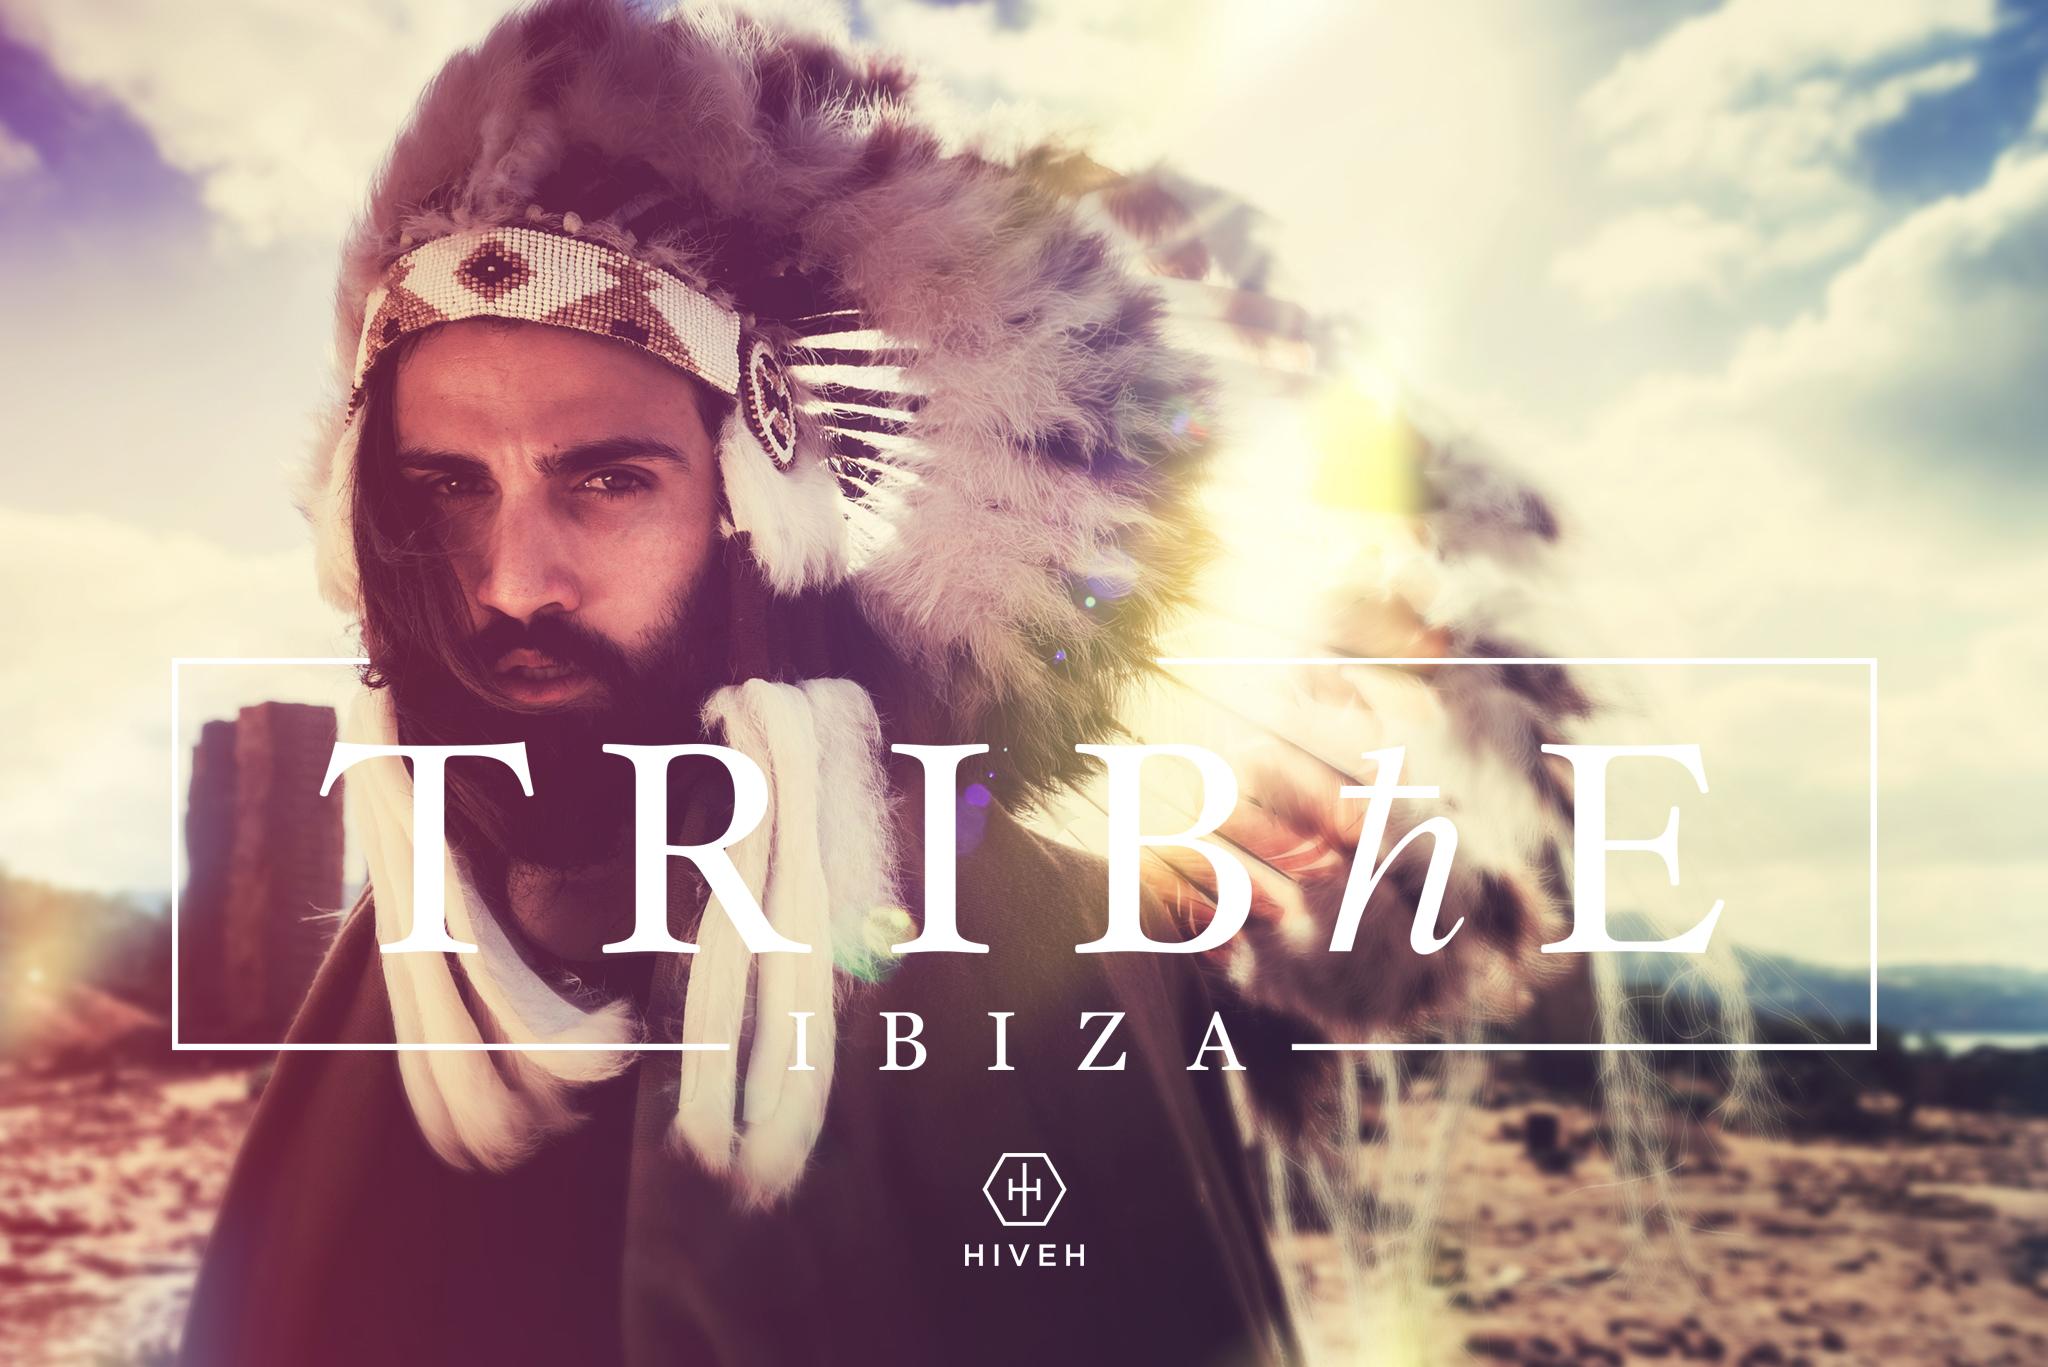 Tribhe, Ibiza, Hiveh, Andy Ricci